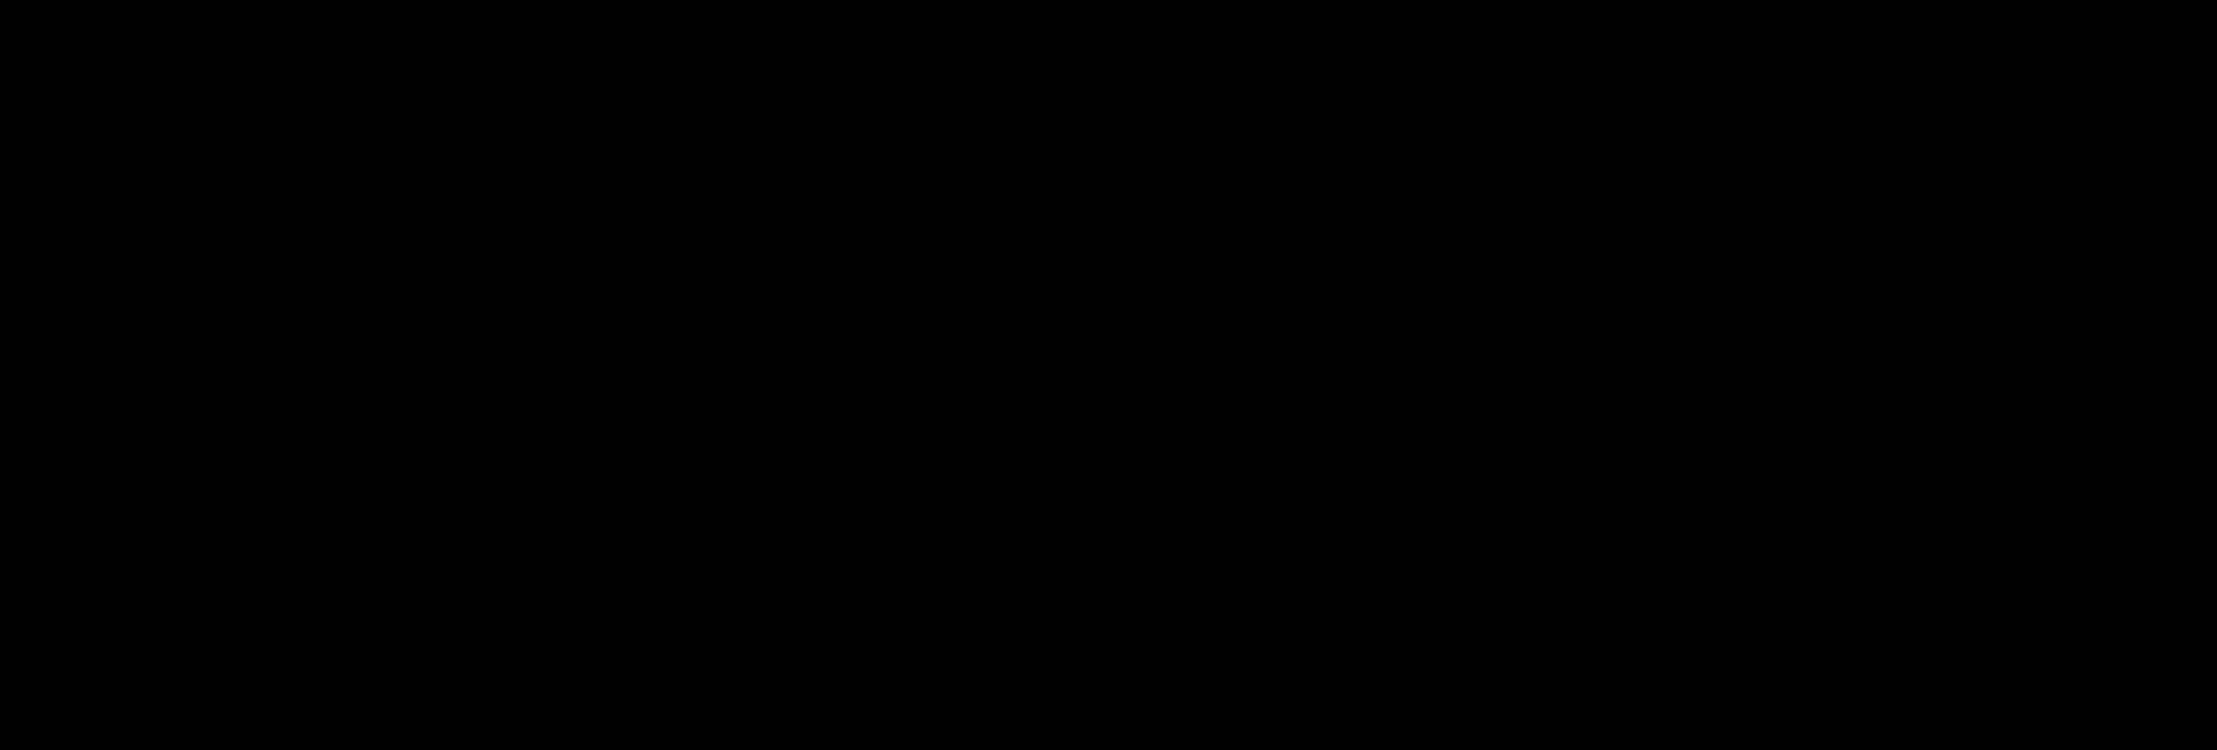 Free spiritual christmas clipart black and white banner black and white download Christian Clip Art Clip Art Christmas Christmas Day Black and white ... banner black and white download